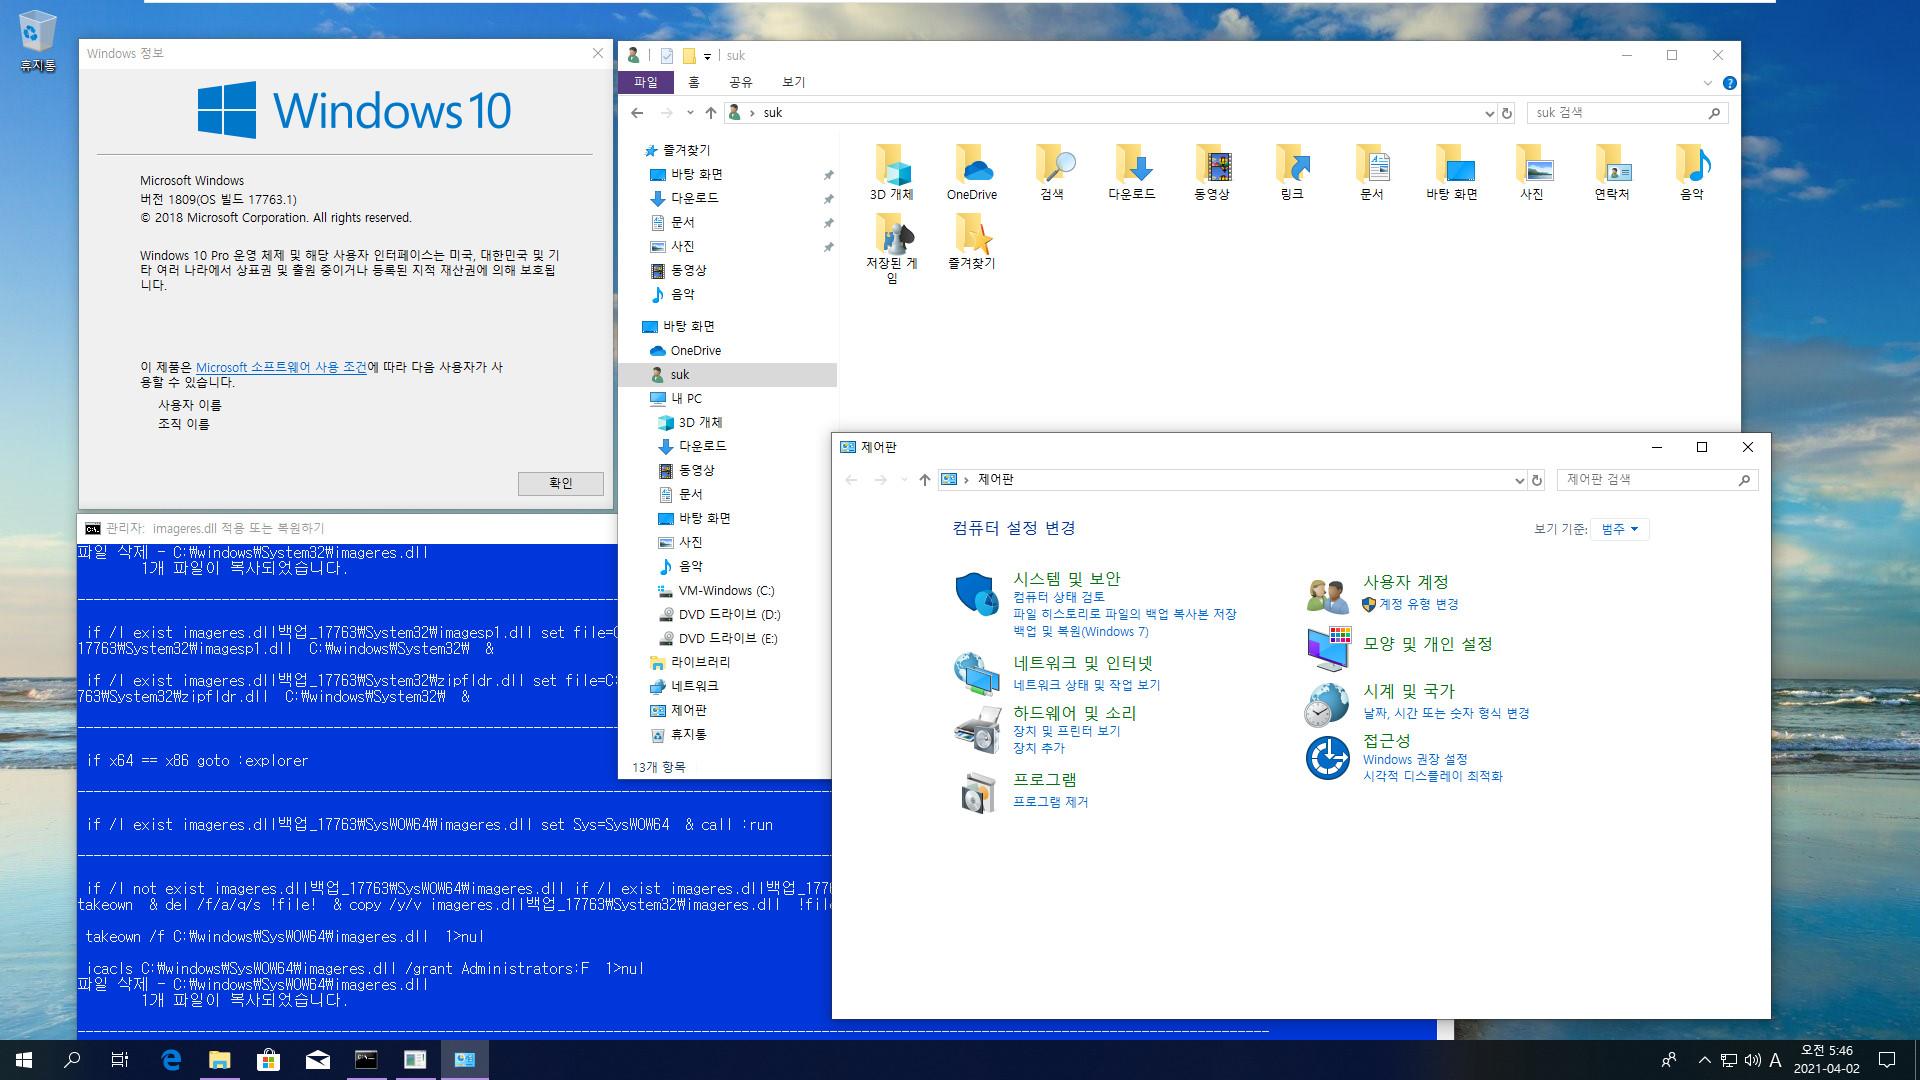 imageres.dll 적용하면 부팅이 안 되는 윈도우는 imageres.dll 2개를 합치면 부팅 됩니다 2021-04-02_054622.jpg